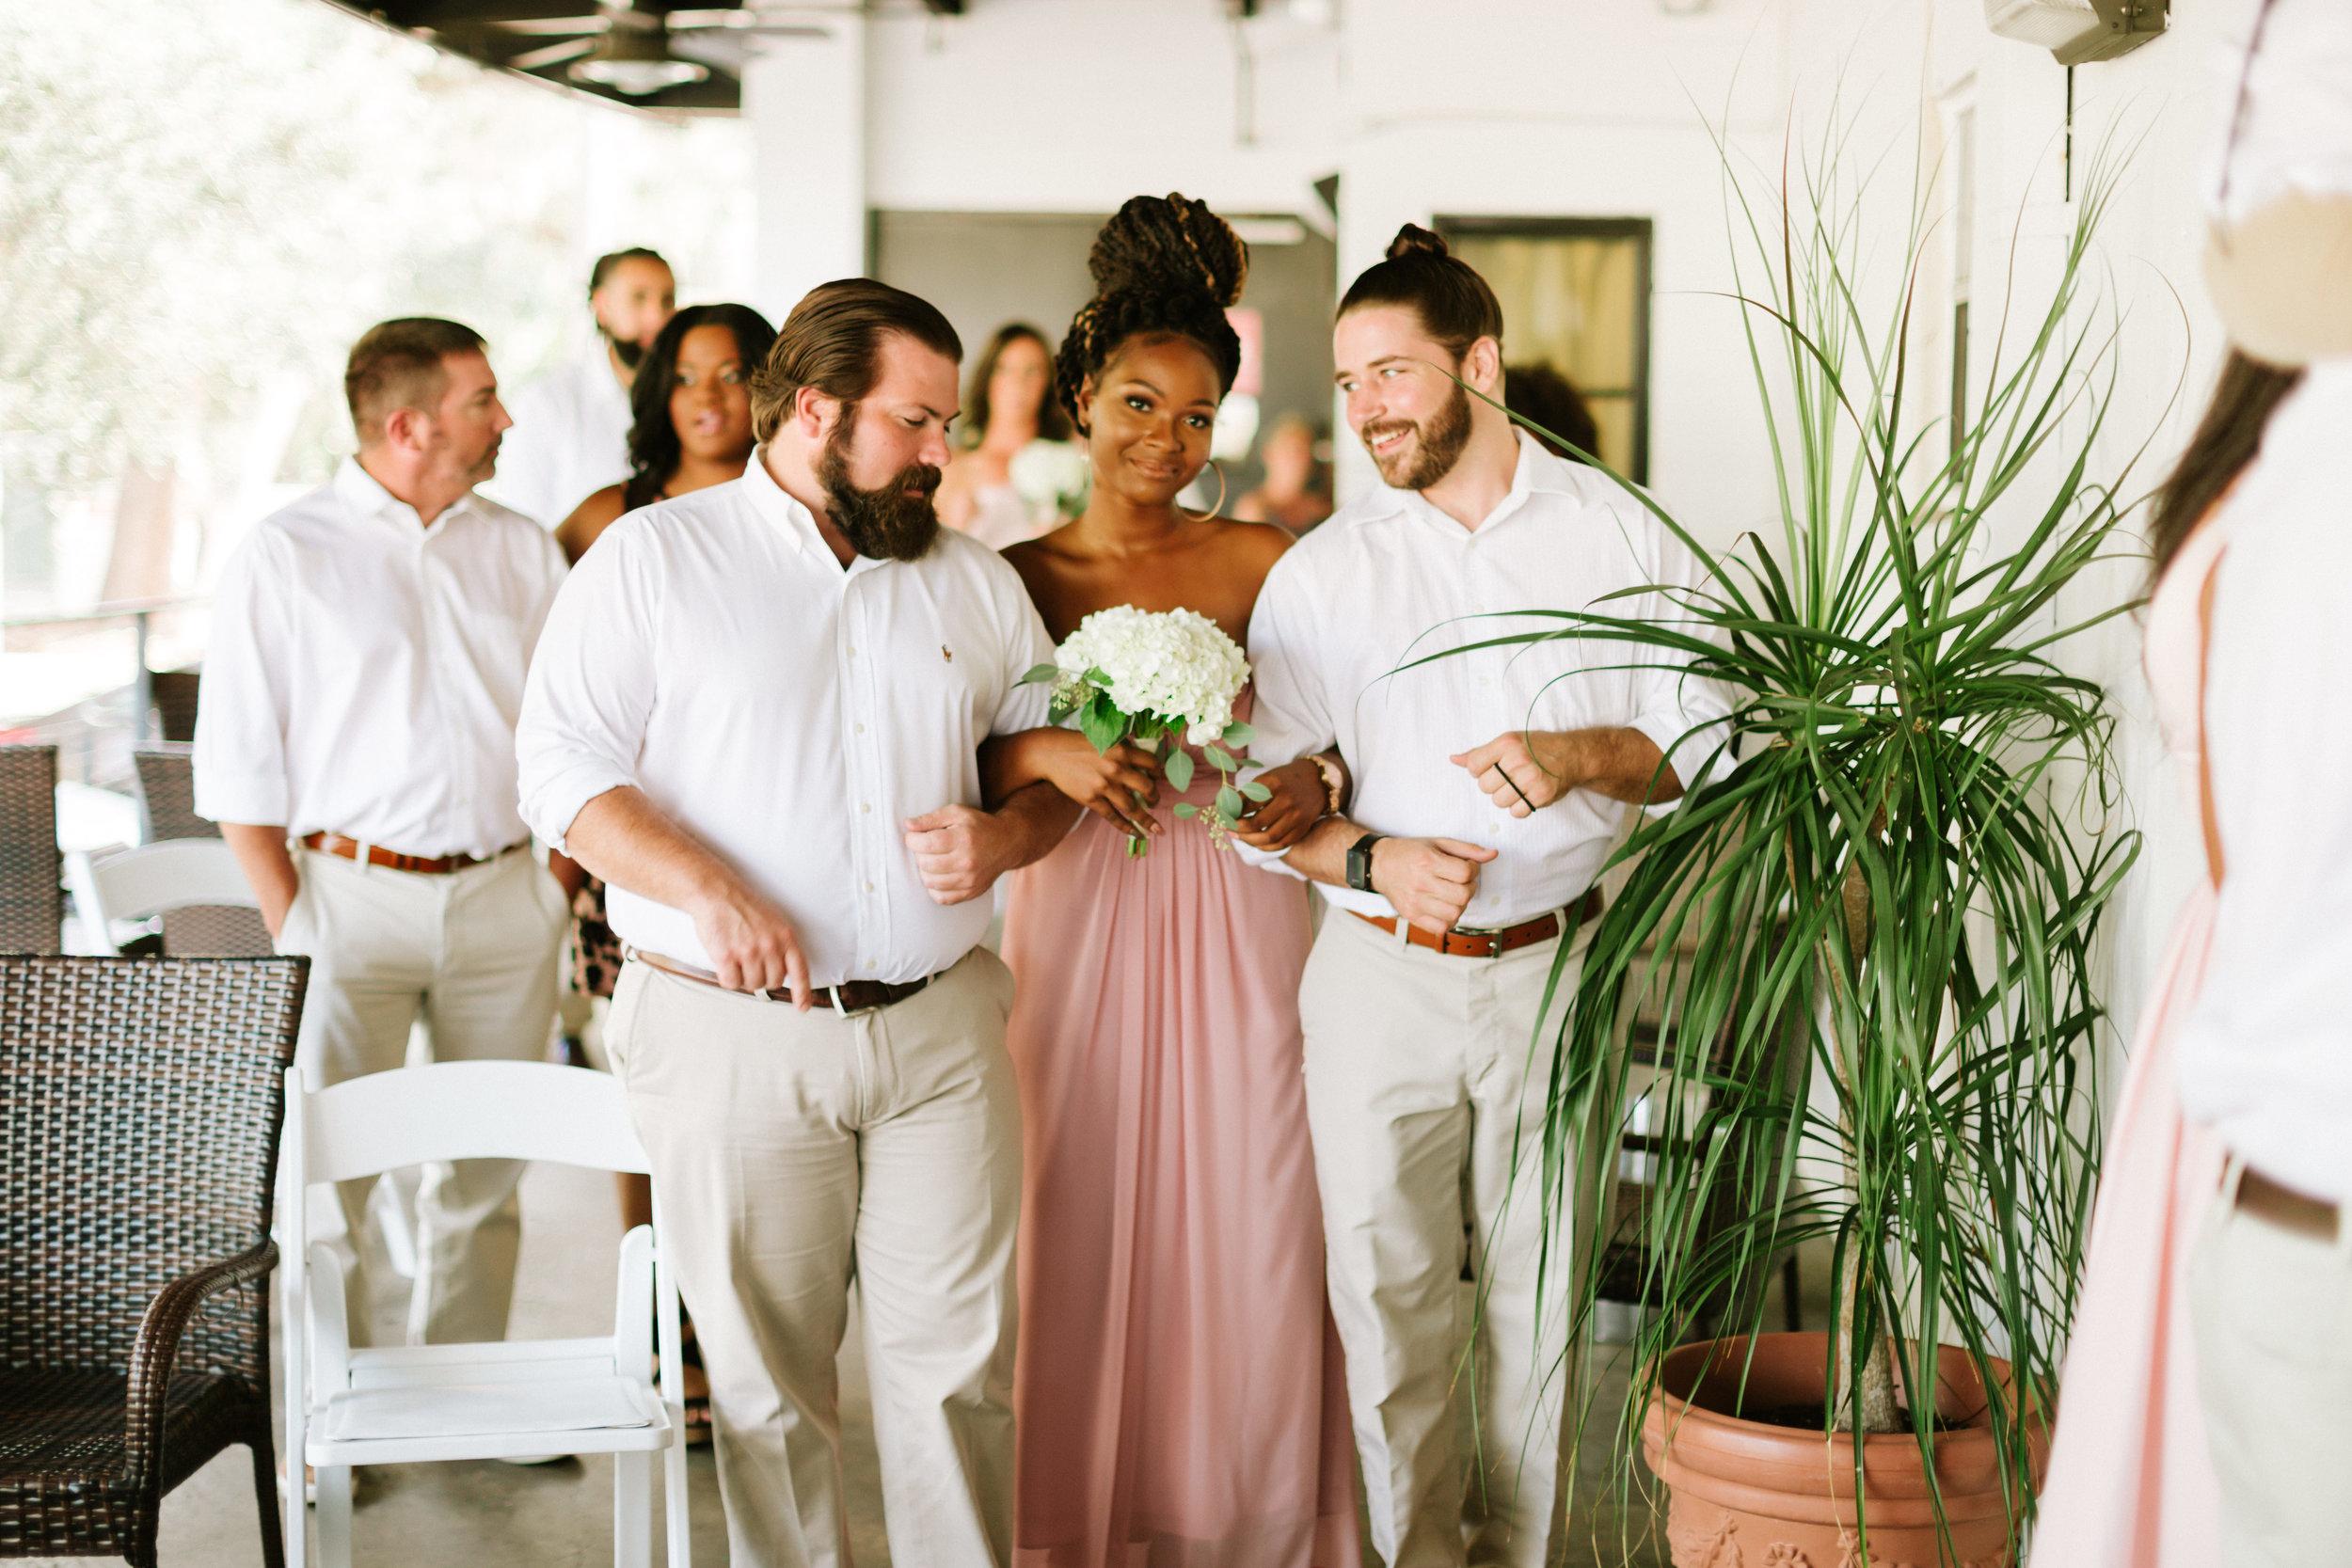 2017.09.16 Ashley and Chuck O'Day Quantam Leap Winery Wedding (107 of 462).jpg